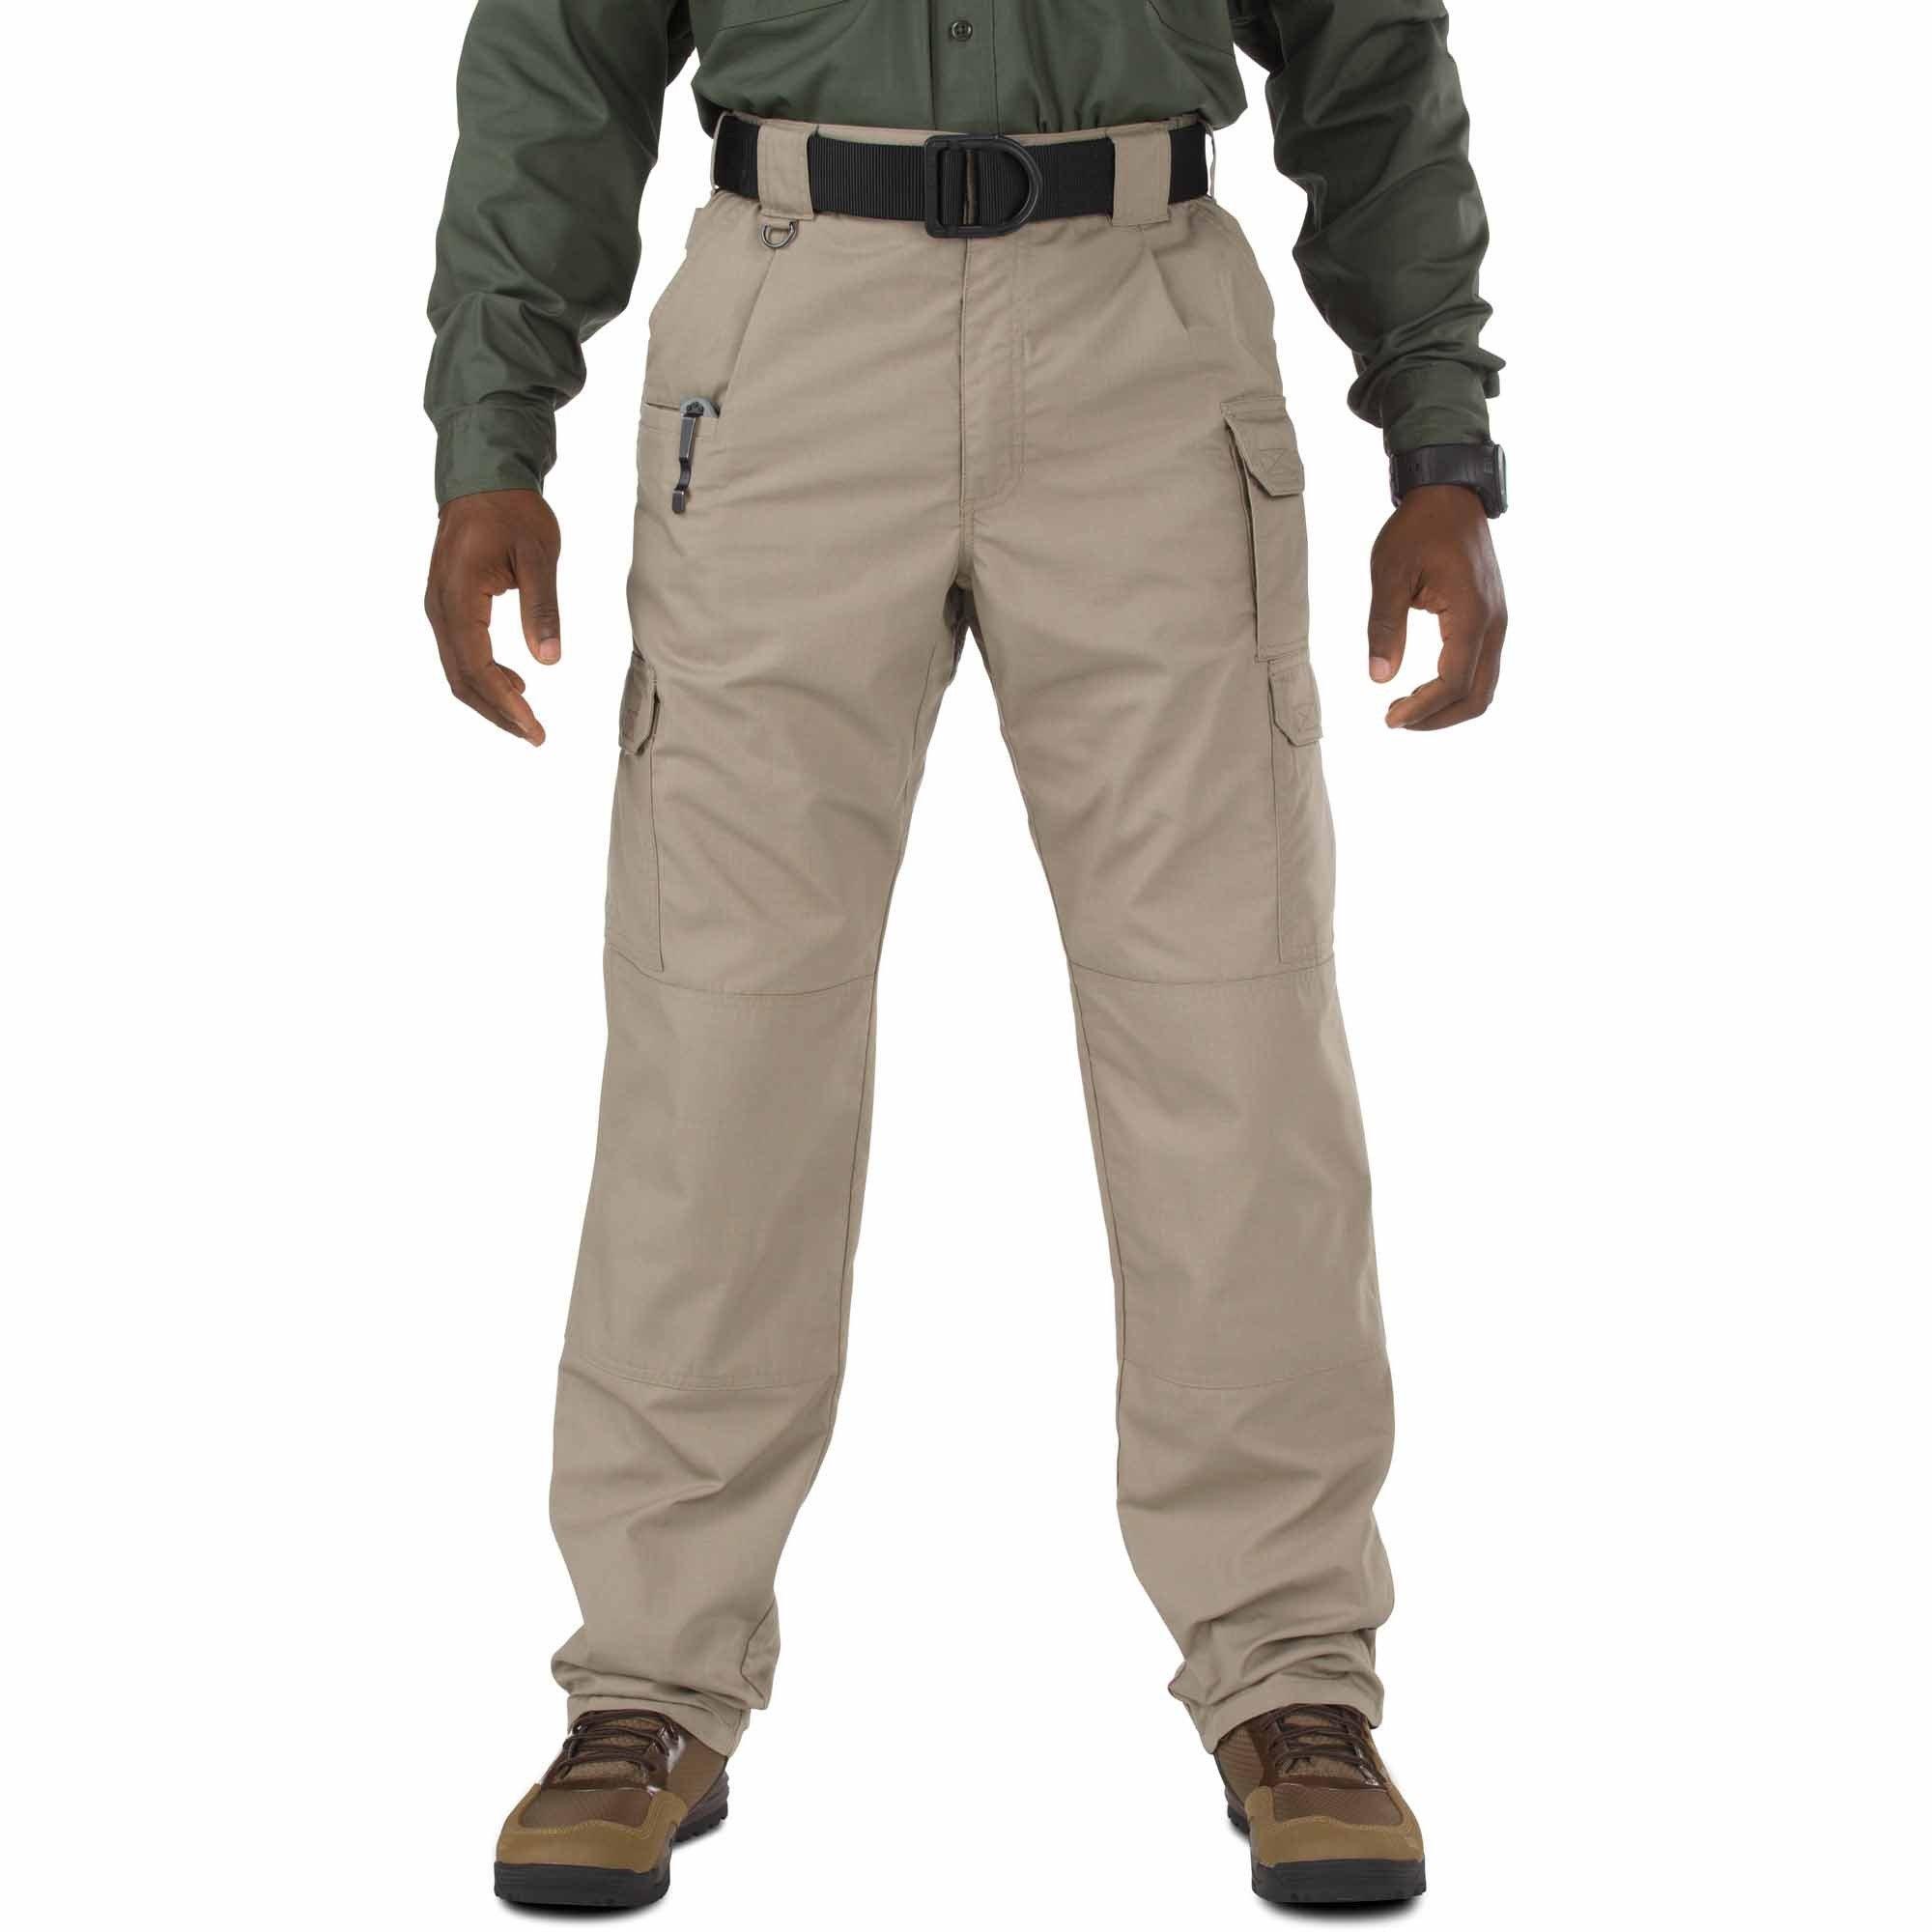 Haggar Clothing   Men's Casual Pants & Dress Pants   Haggar